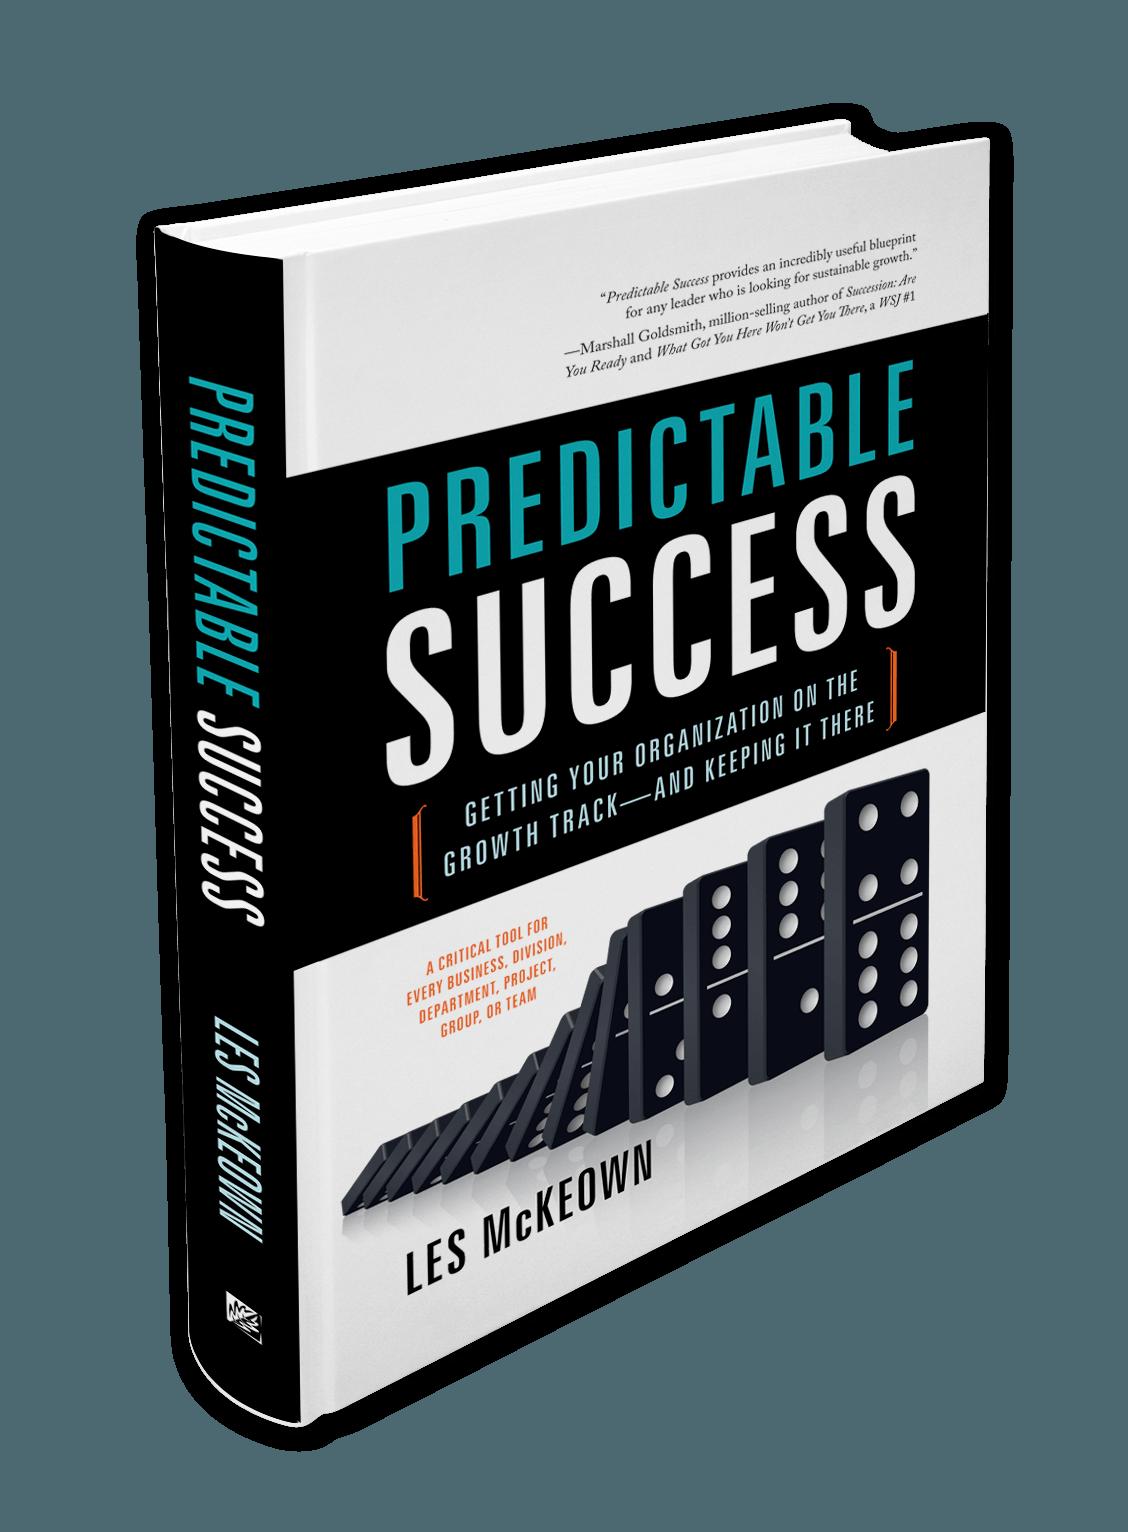 Predictable Success book